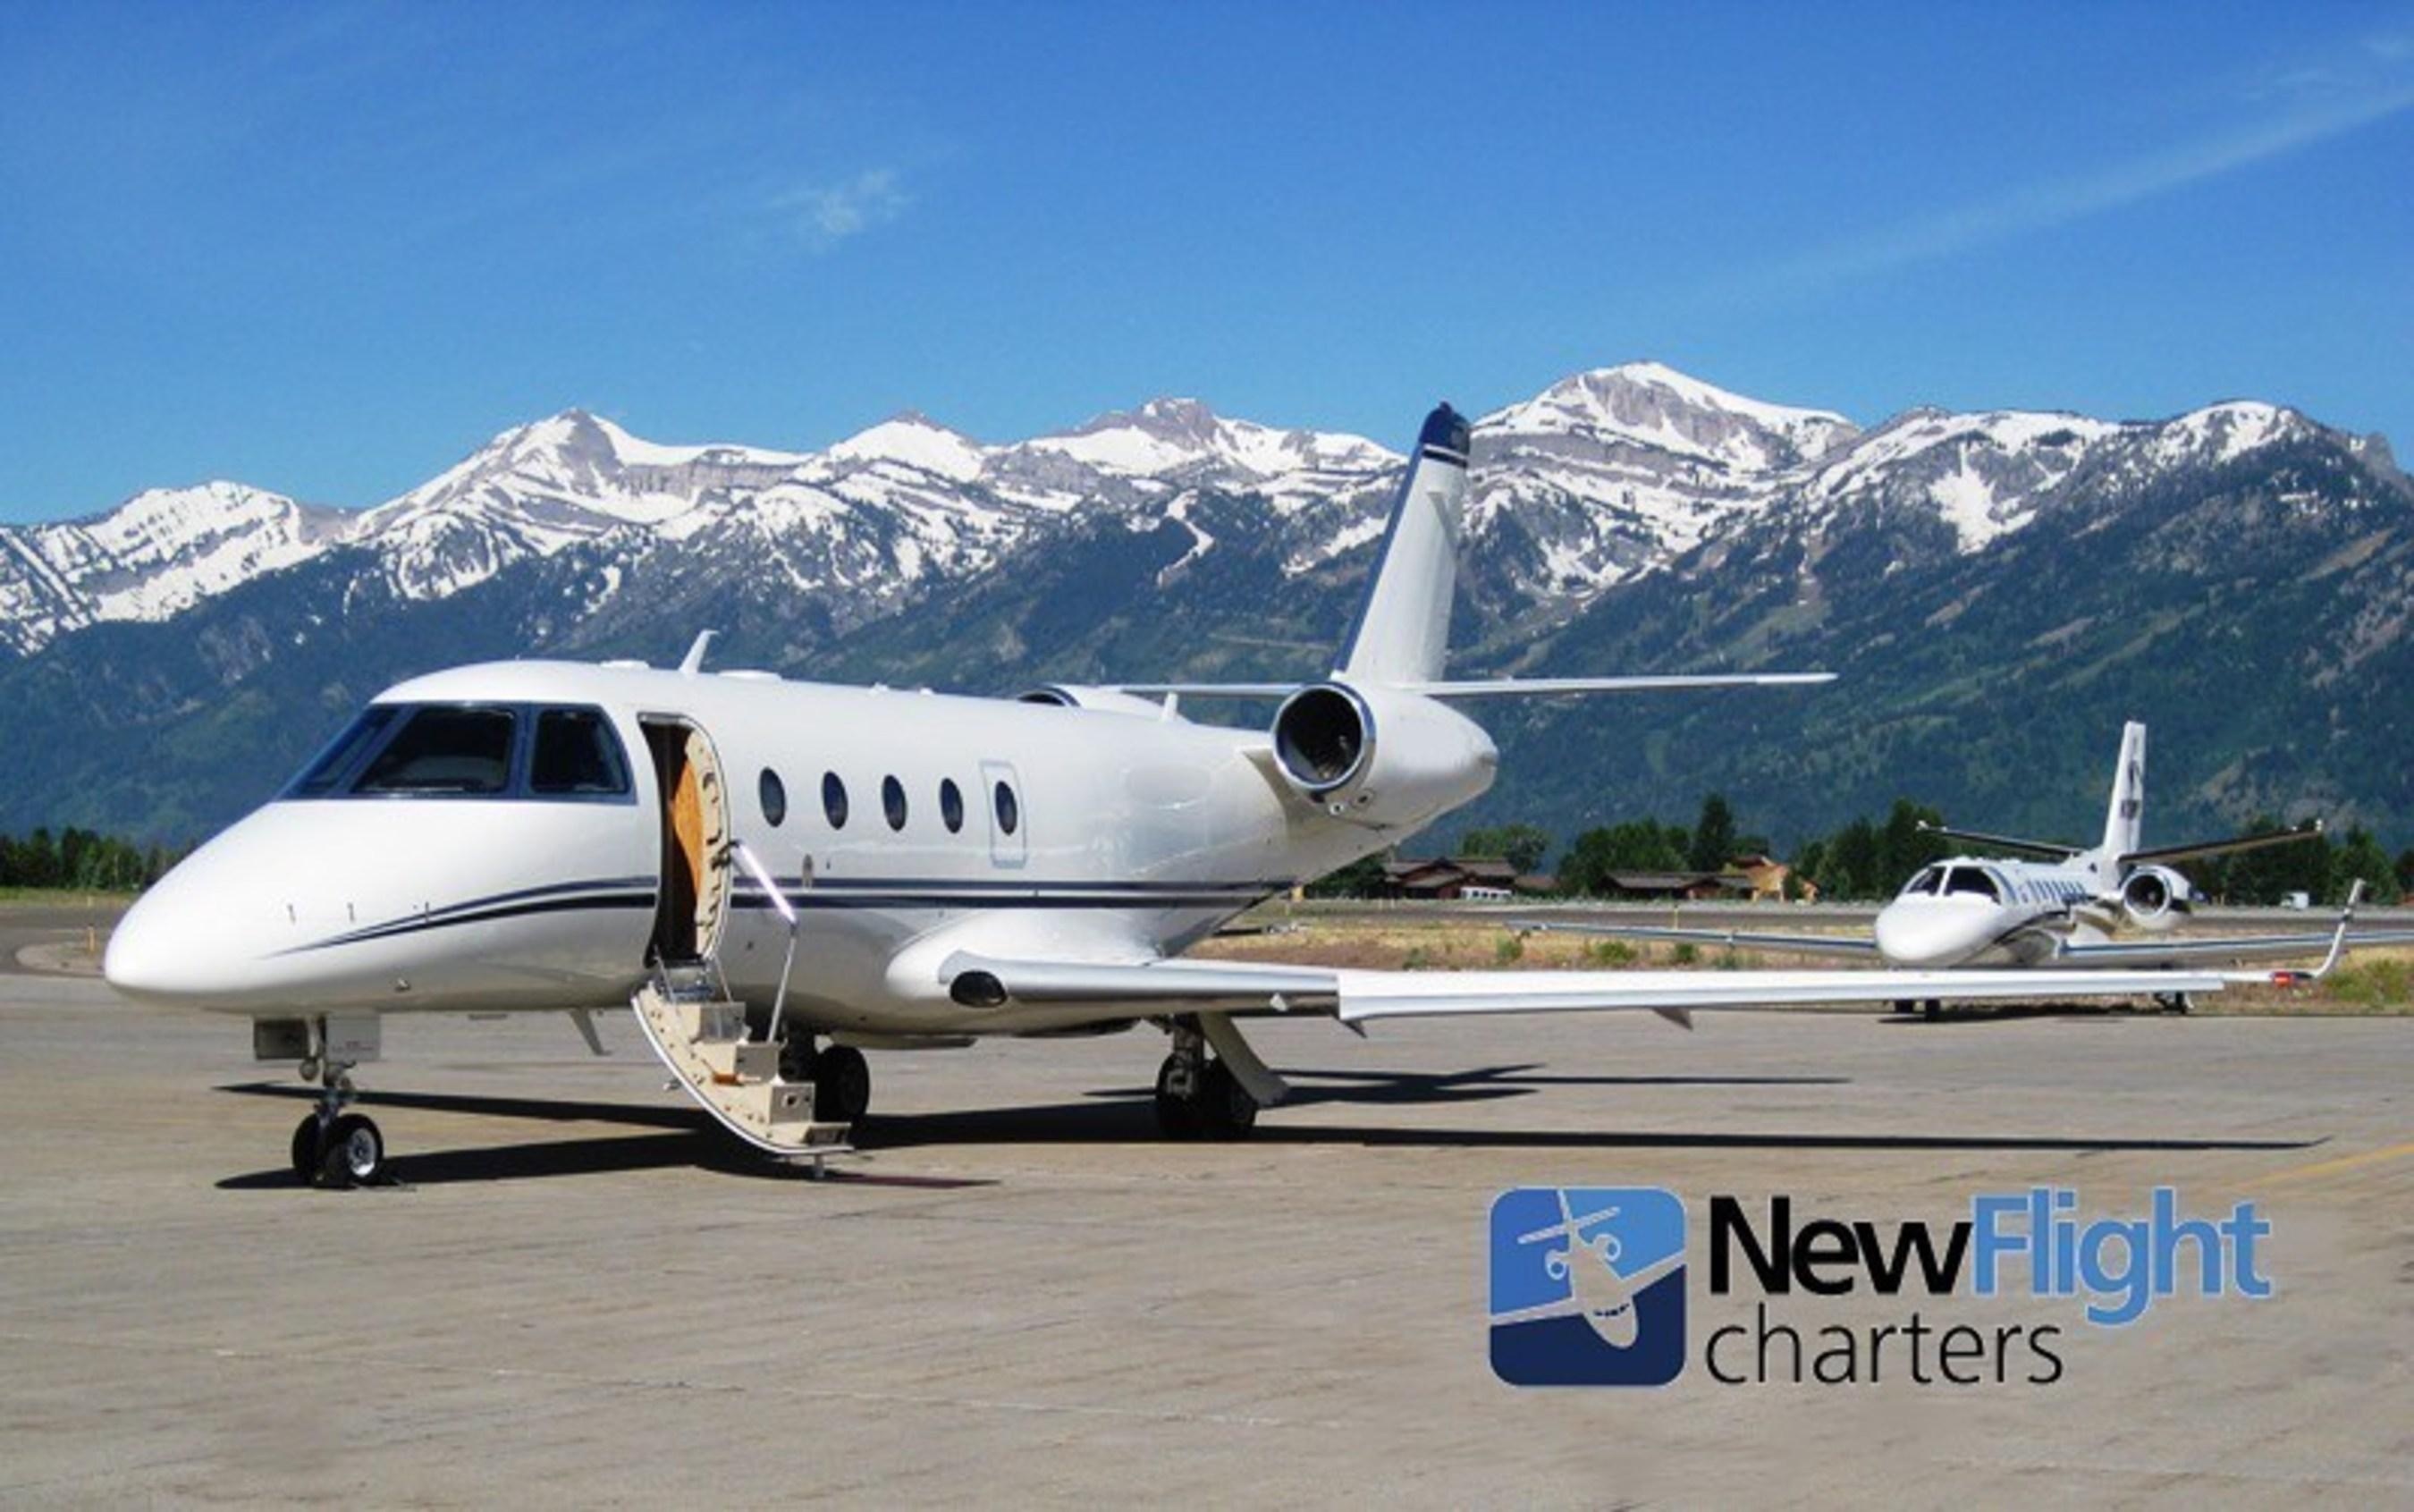 New Flight Charters Private Jet Awating Passengers